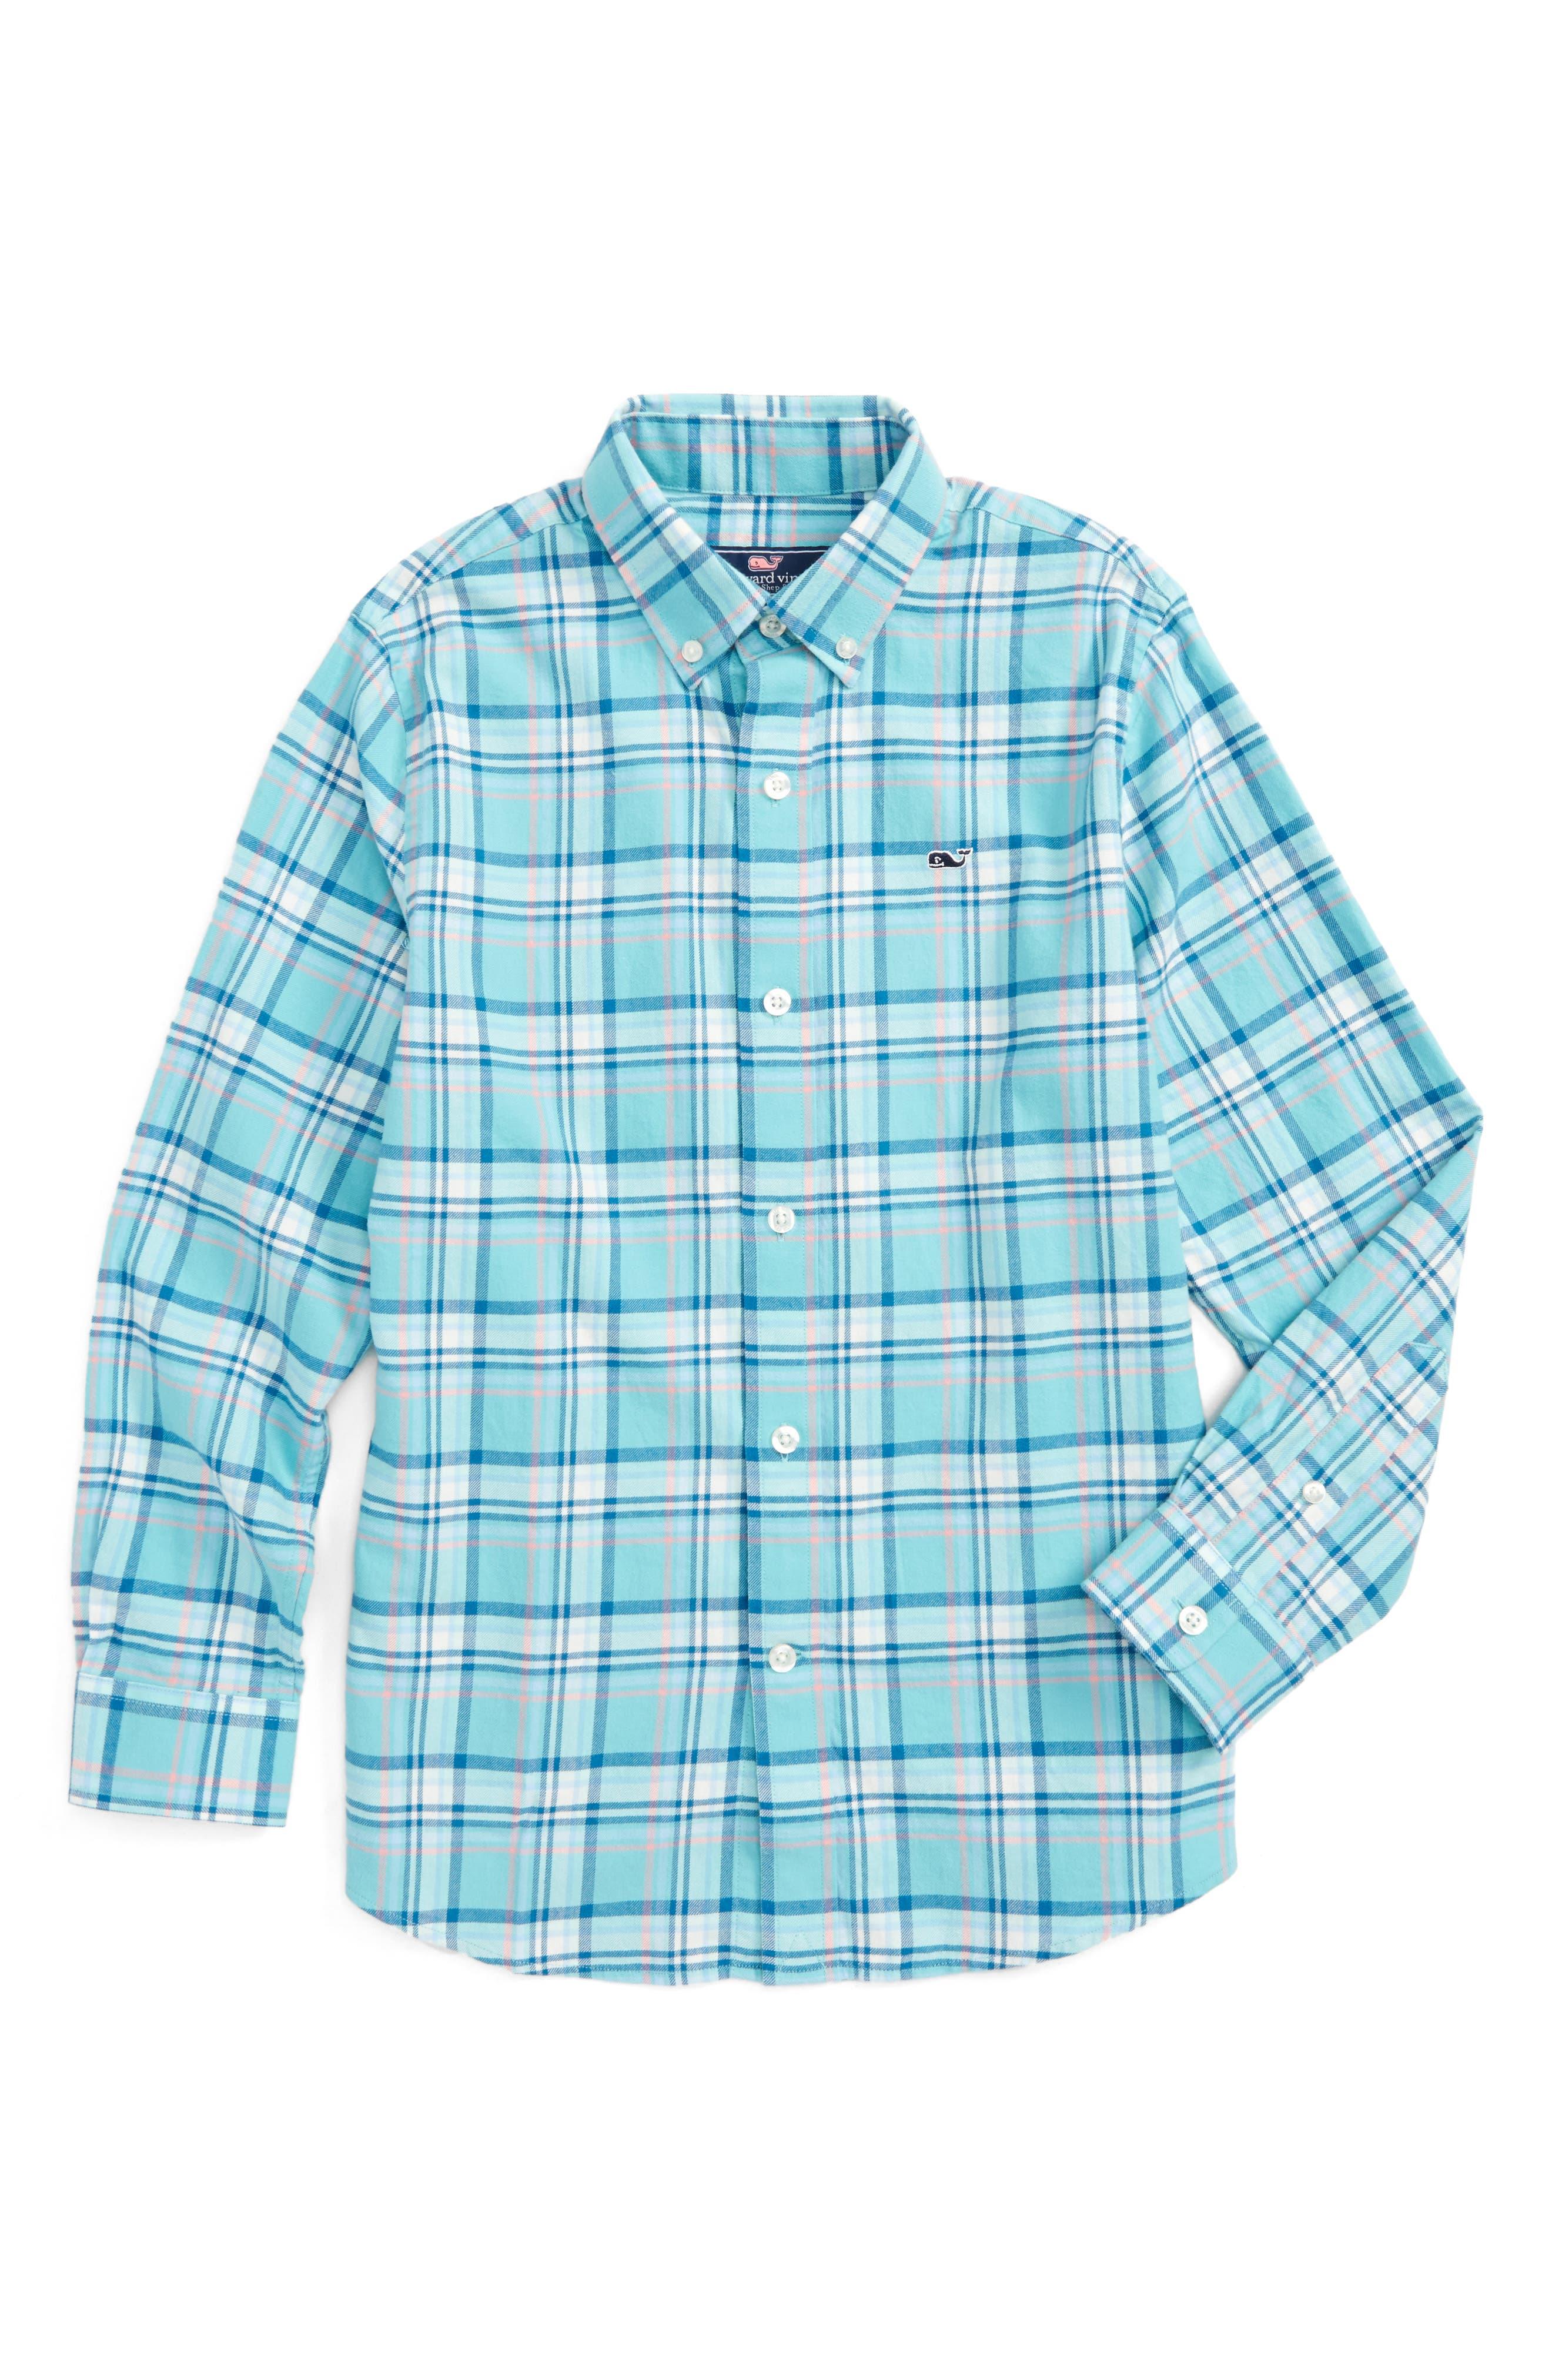 Loblolly Plaid Shirt,                             Main thumbnail 1, color,                             442